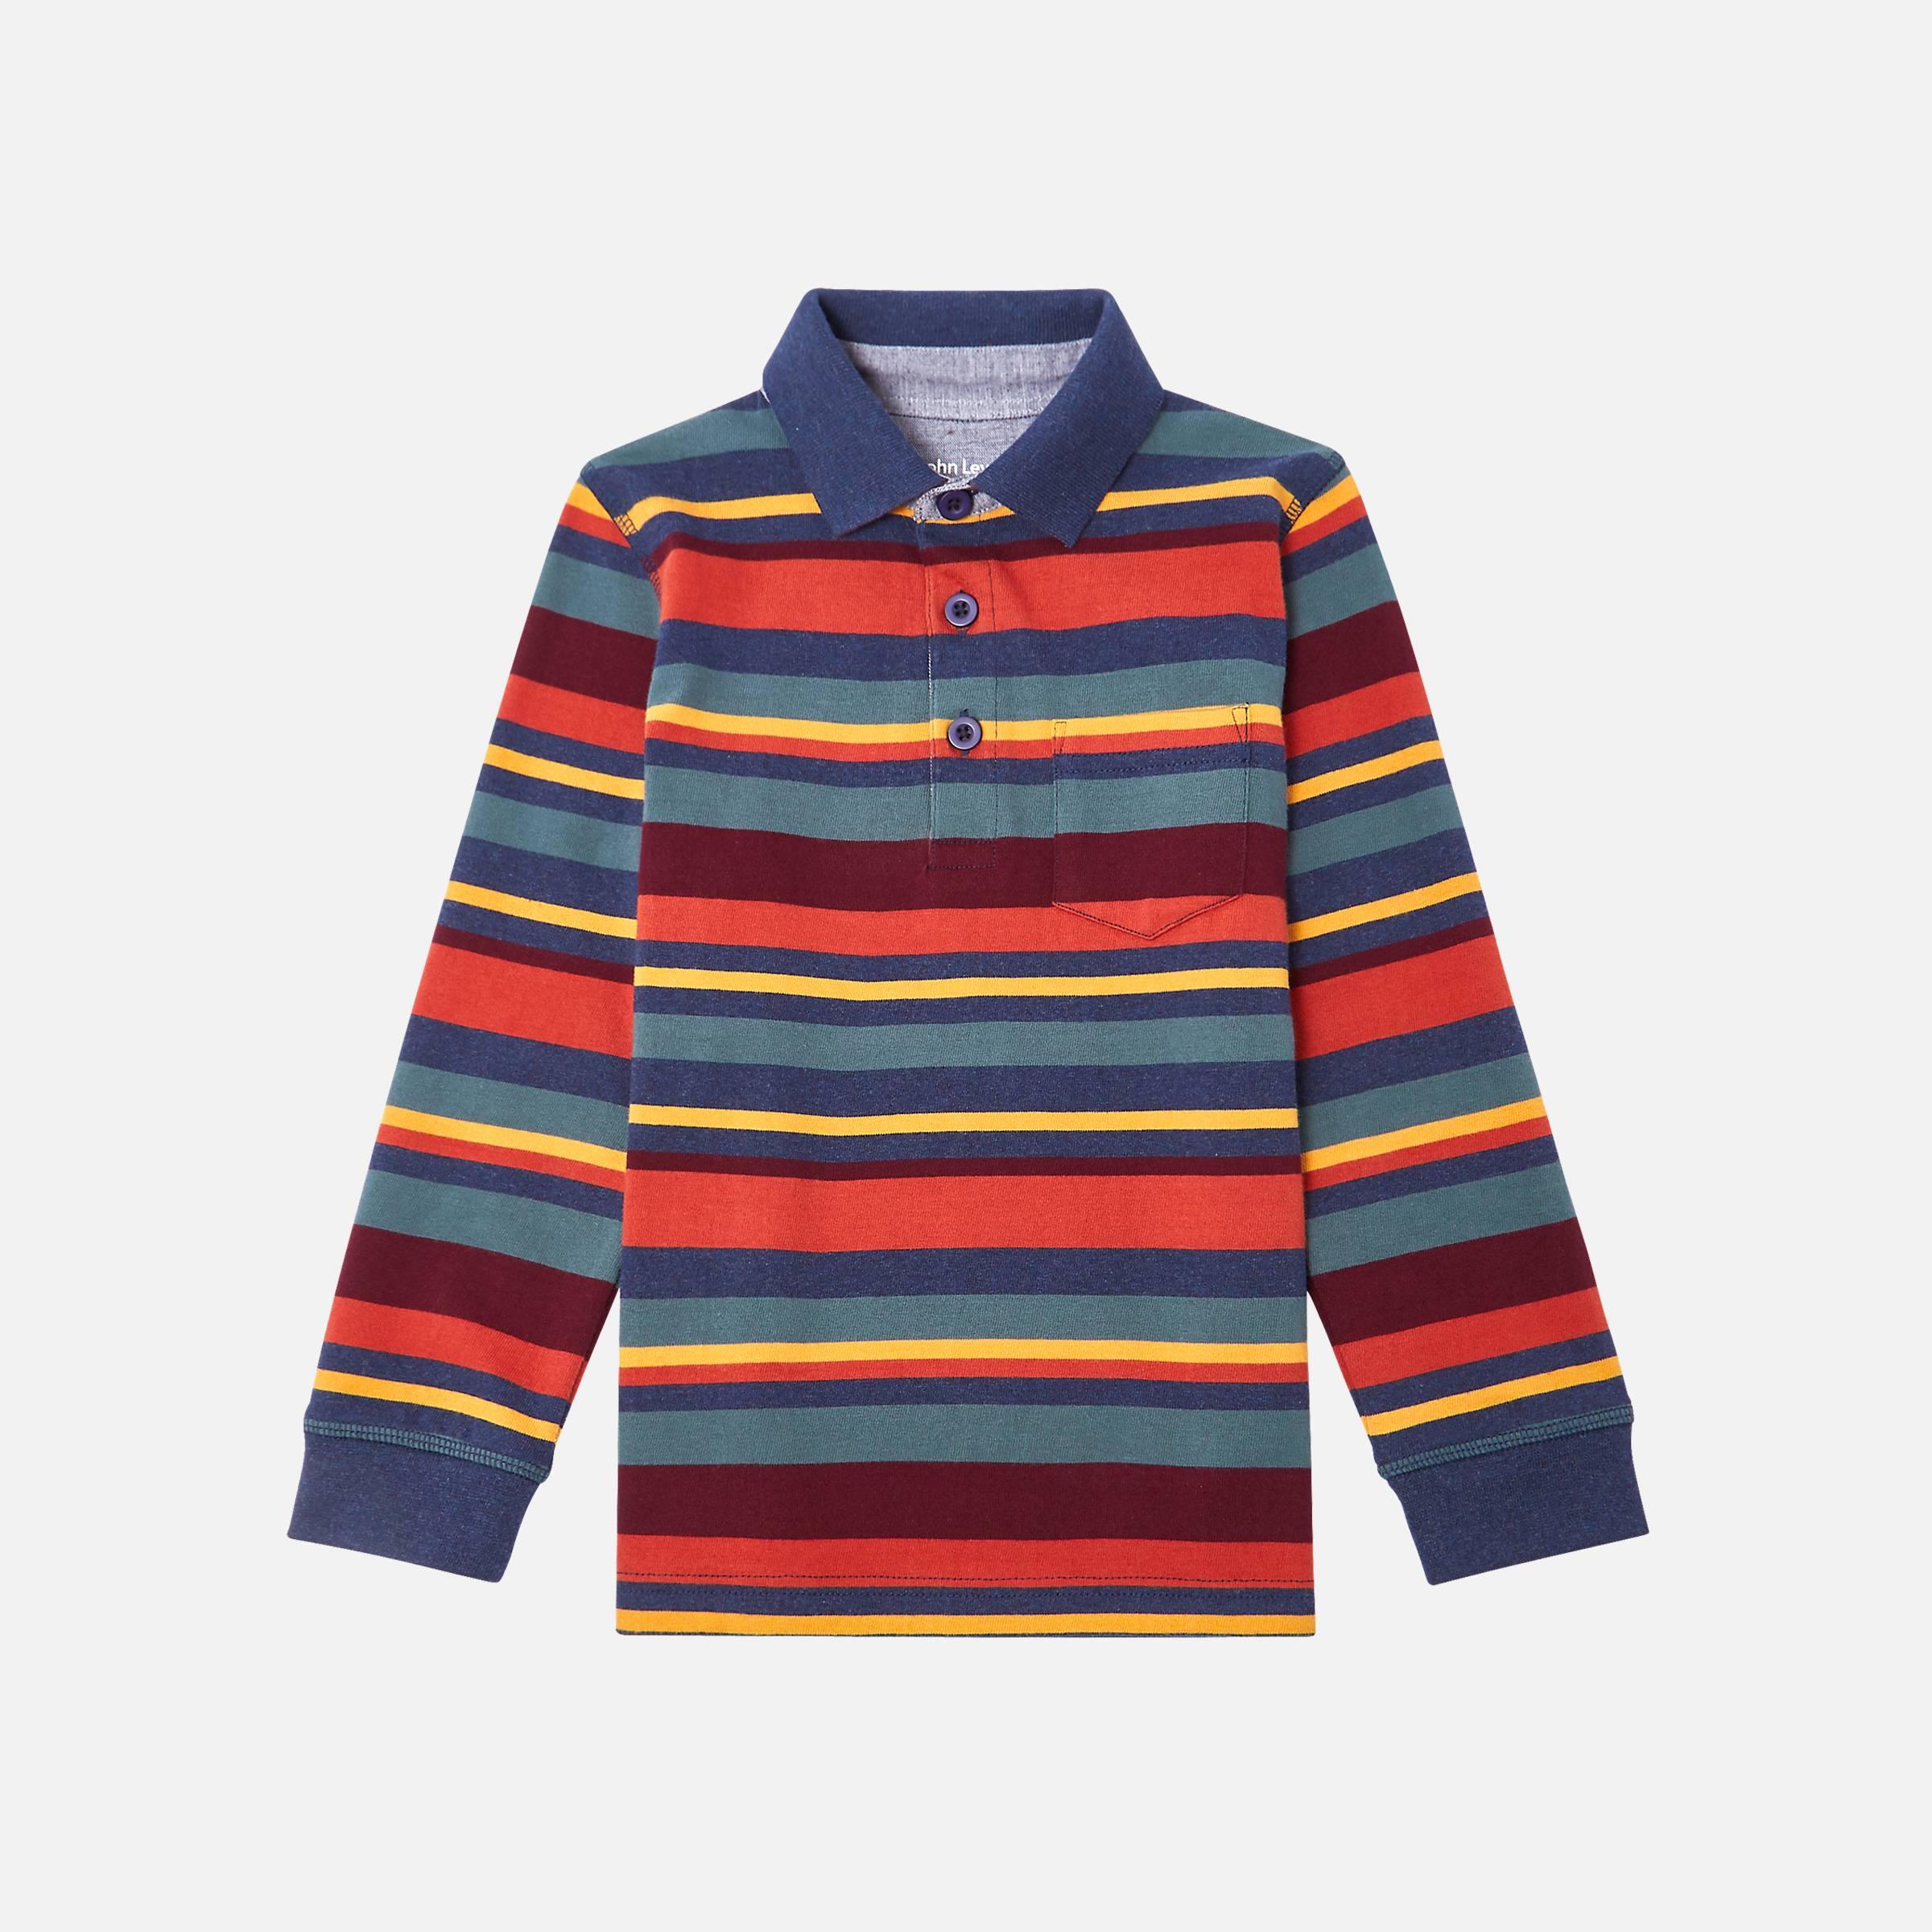 Boys\' Clothes   Boys\' Tops, Trousers & Jackets   John Lewis